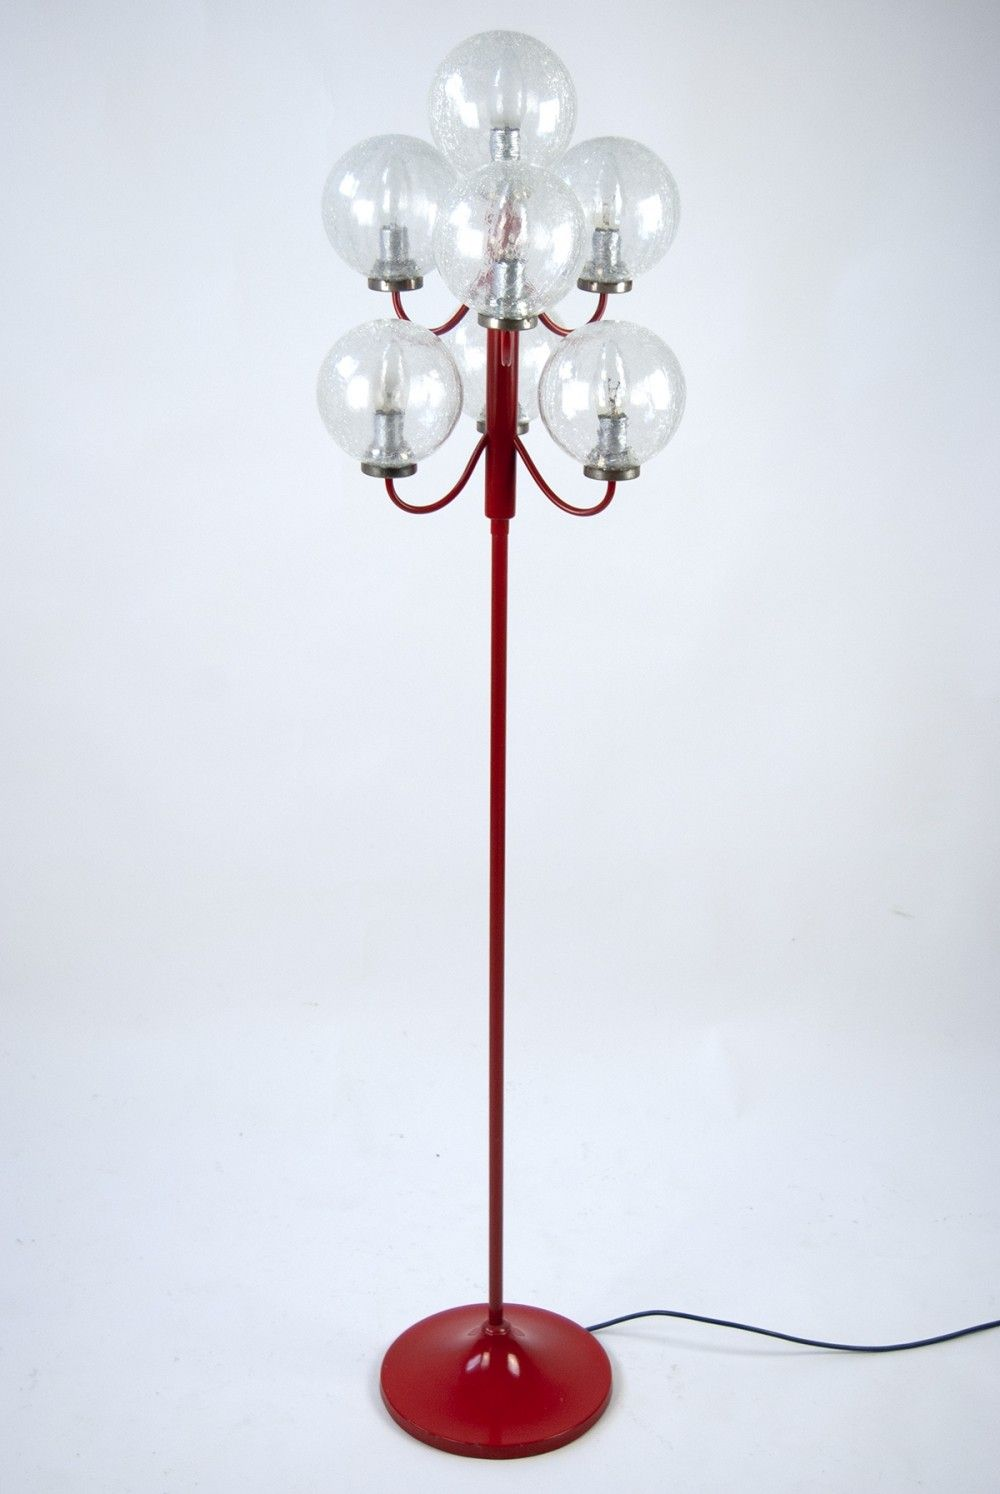 Vintage Red Floor Lamp By Kaiser Leuchten From 1960s With 7 Glass Balls Lamp Red Floor Lamp Glass Ball